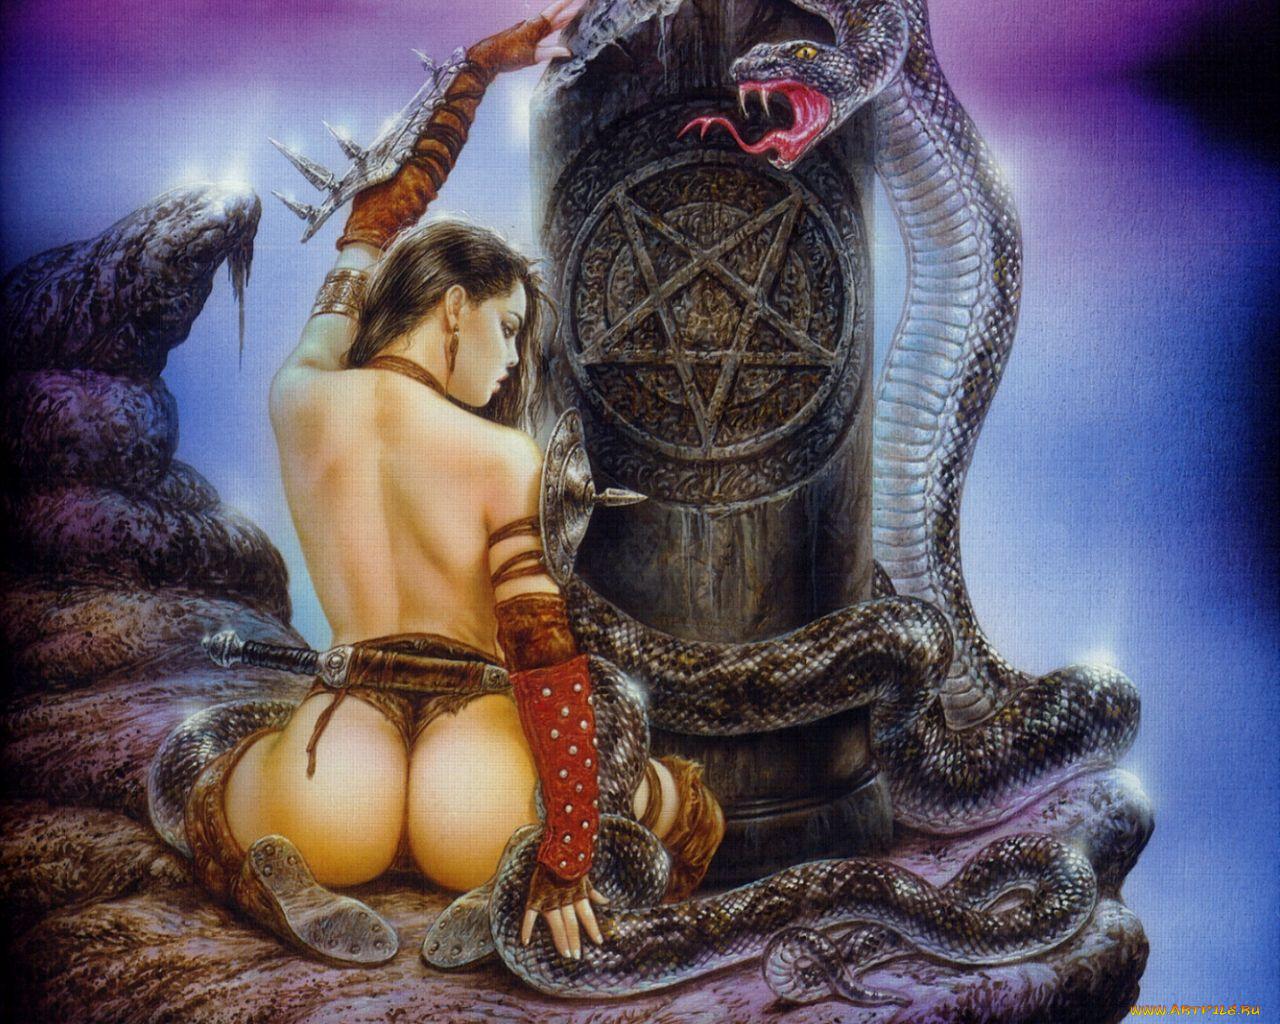 Abstract fantasy erotic art naked tube